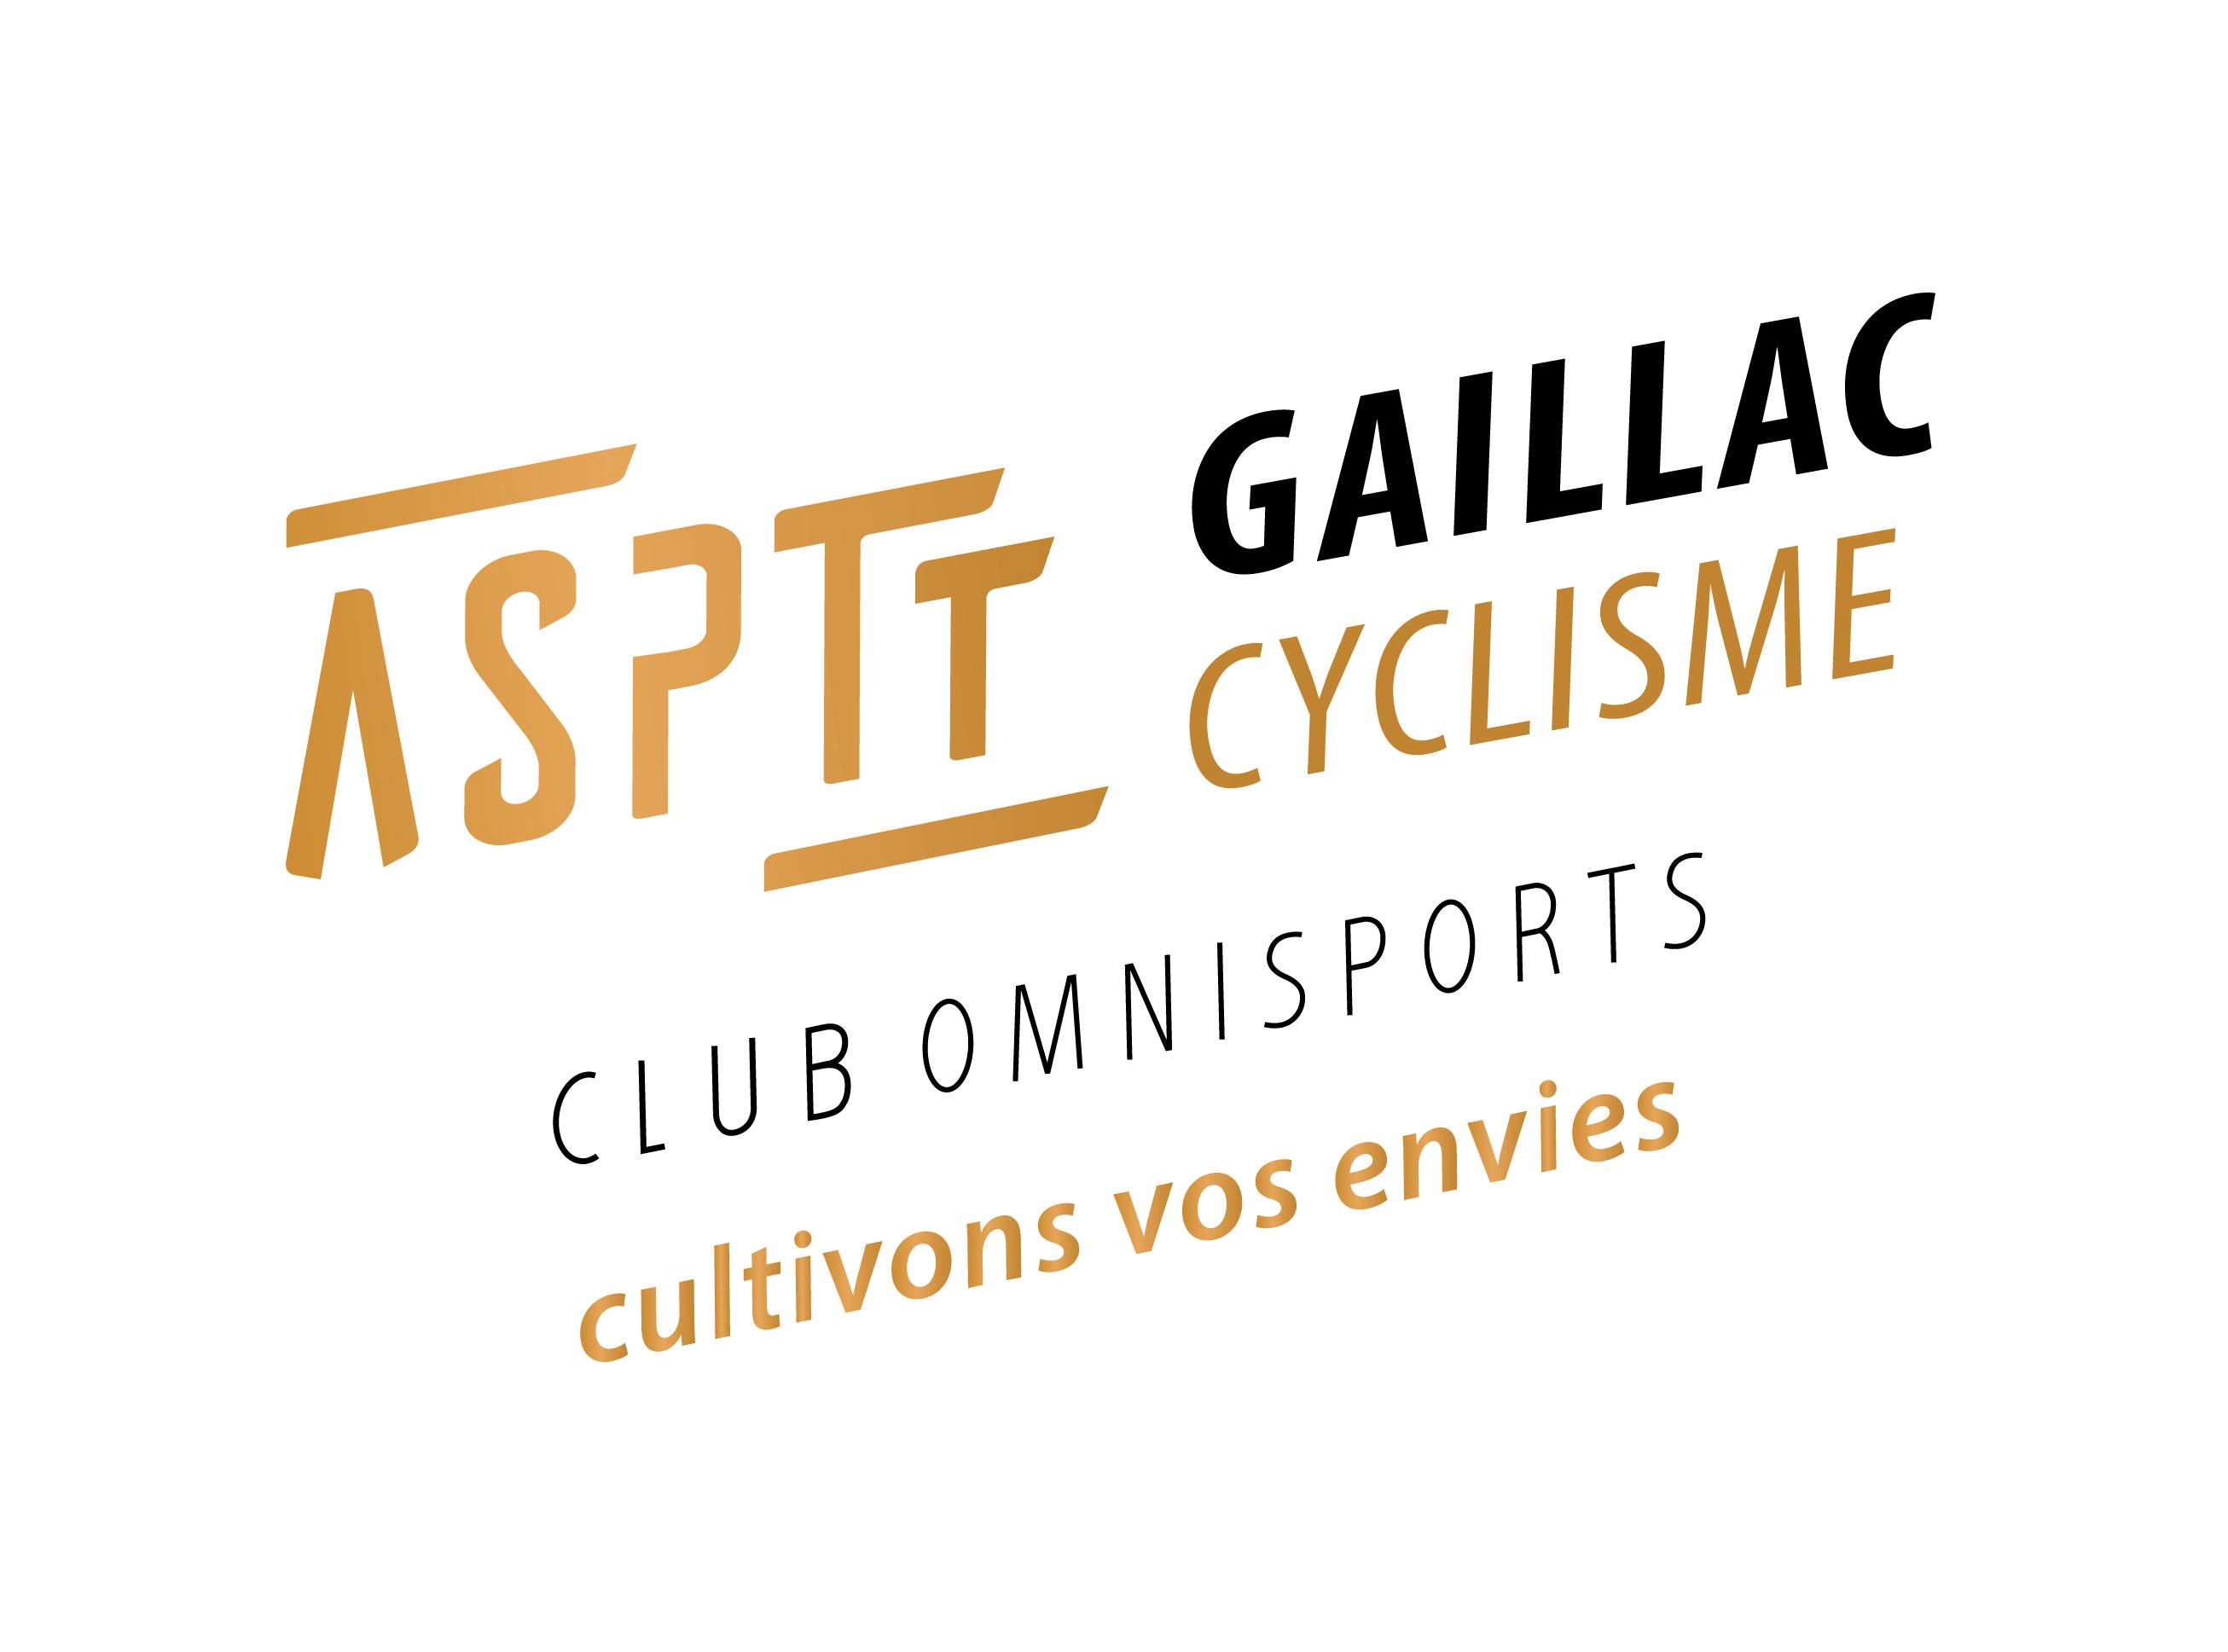 CYCLOSPORT ASPTT GAILLAC